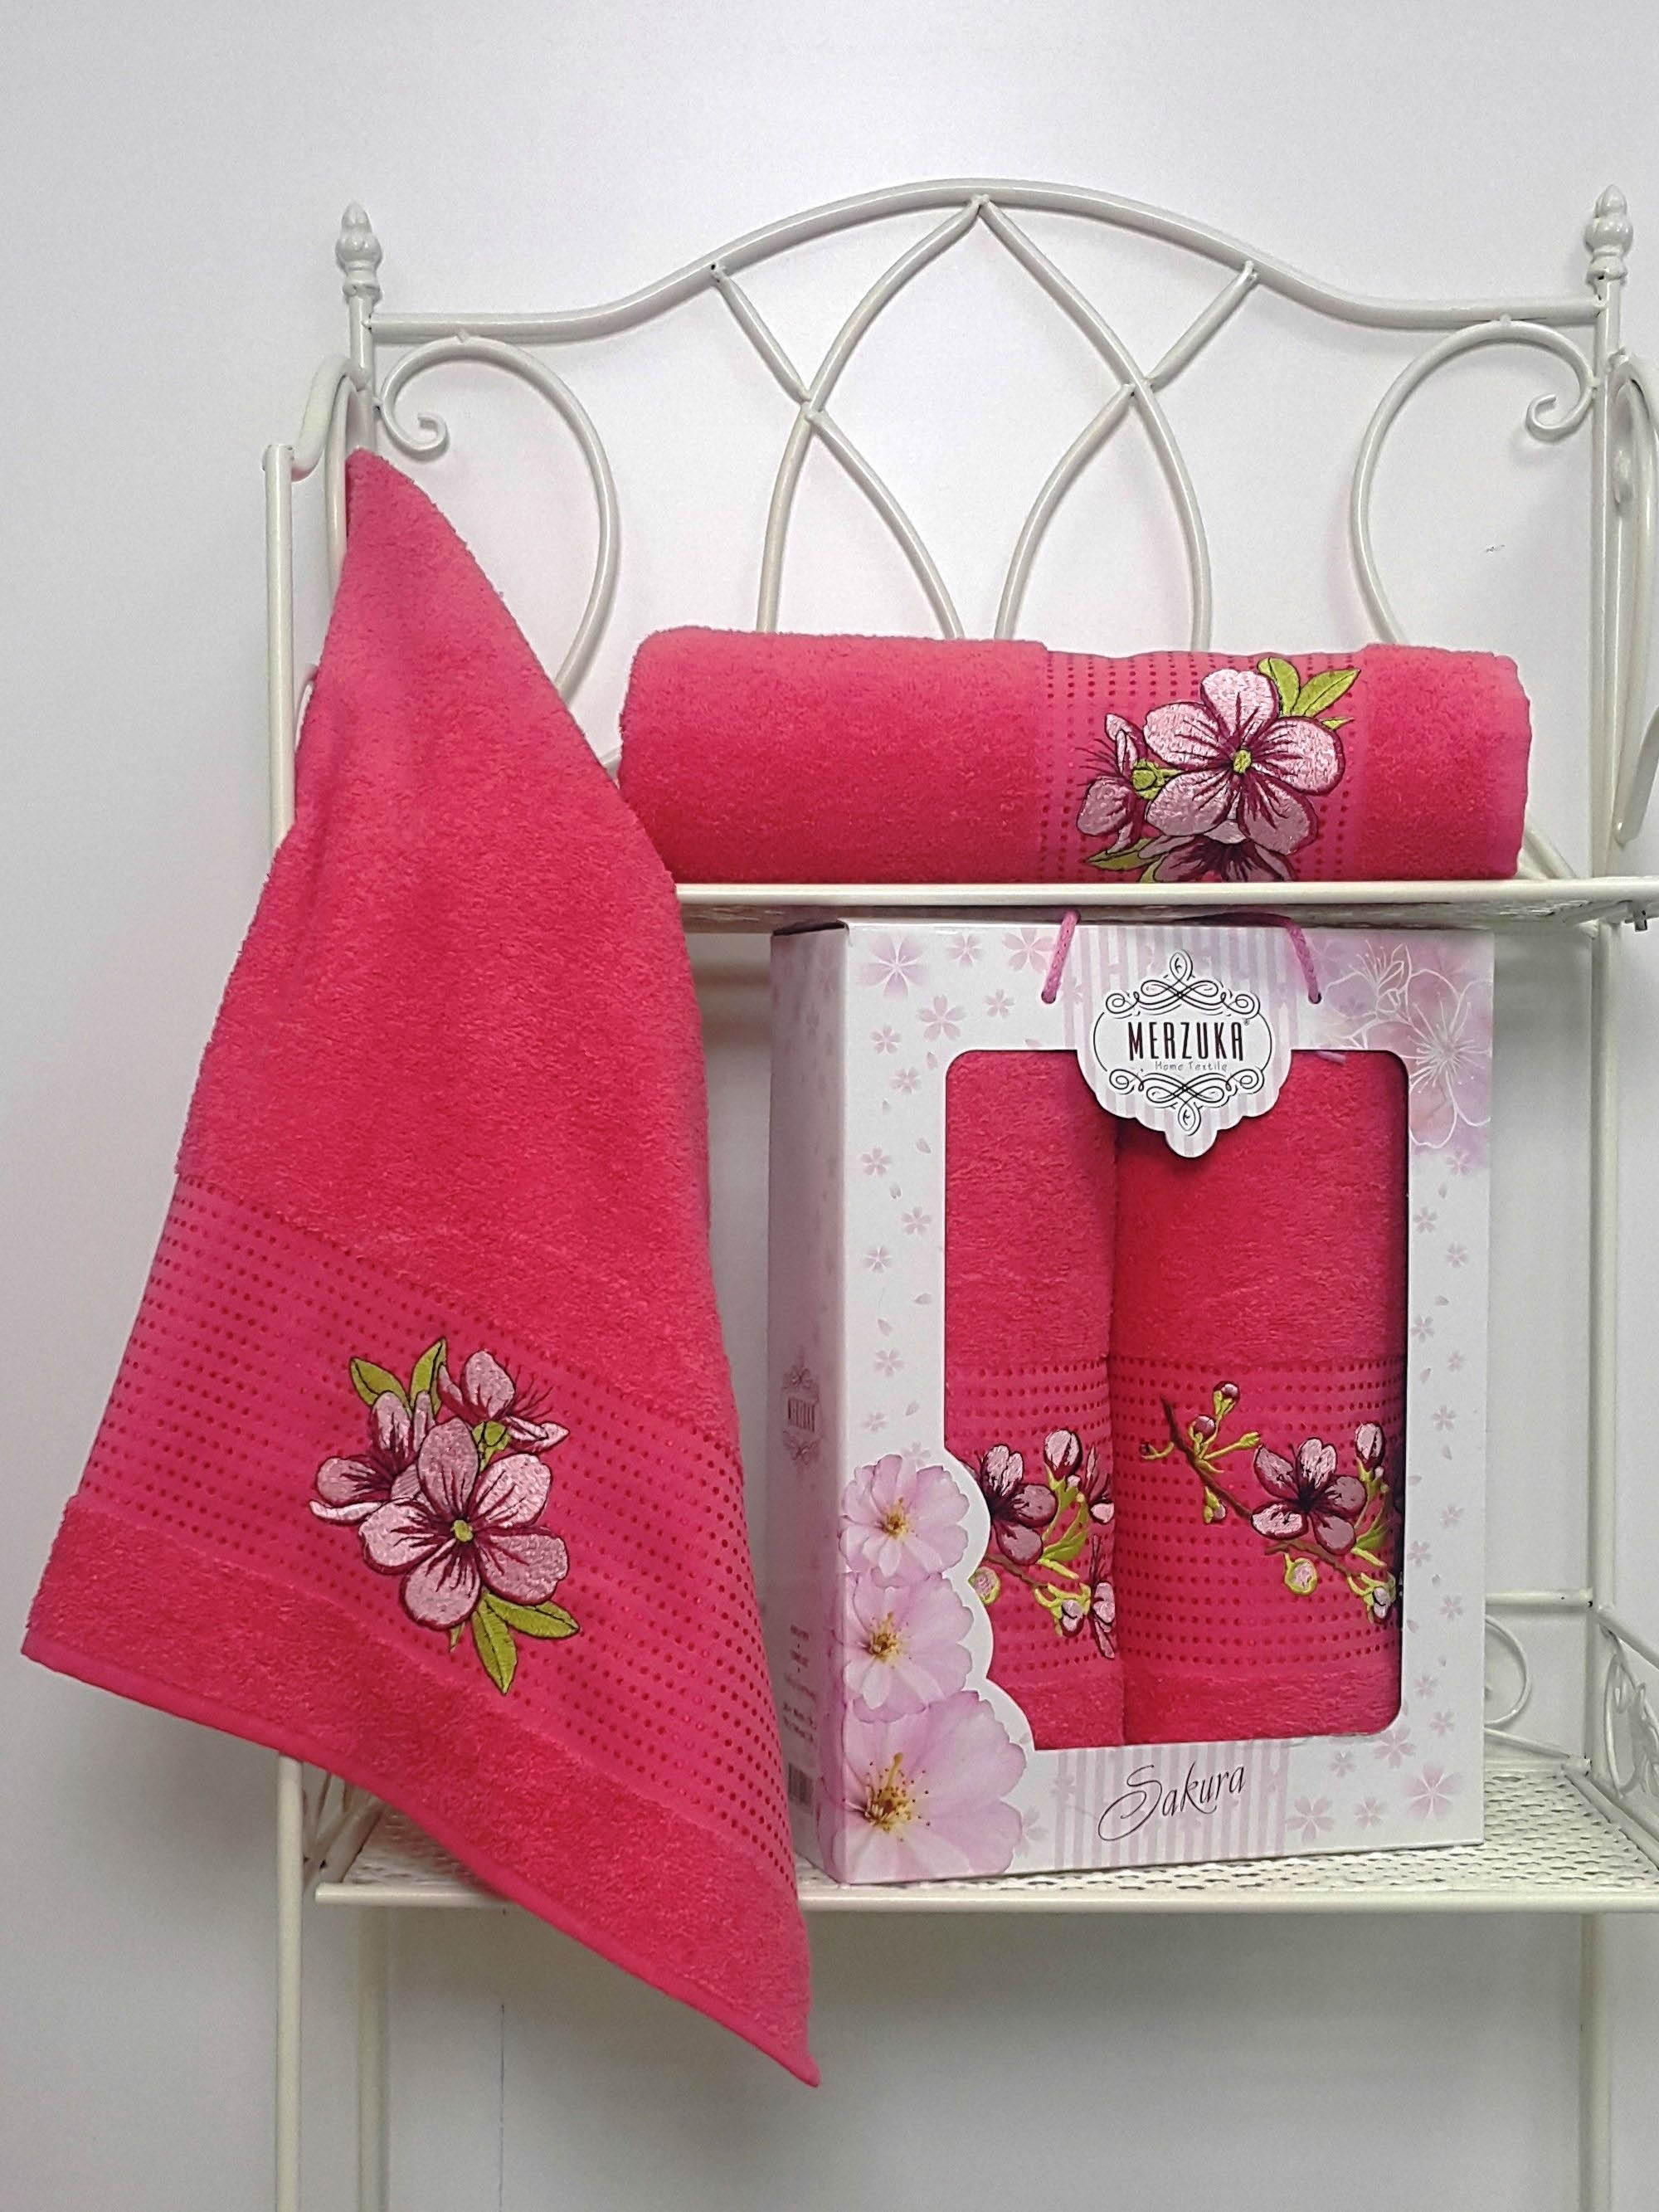 Полотенца Oran Merzuka Полотенце Sakura Цвет: Малиновый (Набор) набор из 3 полотенец merzuka sakura 50х90 2 70х140 8432 терракотовый